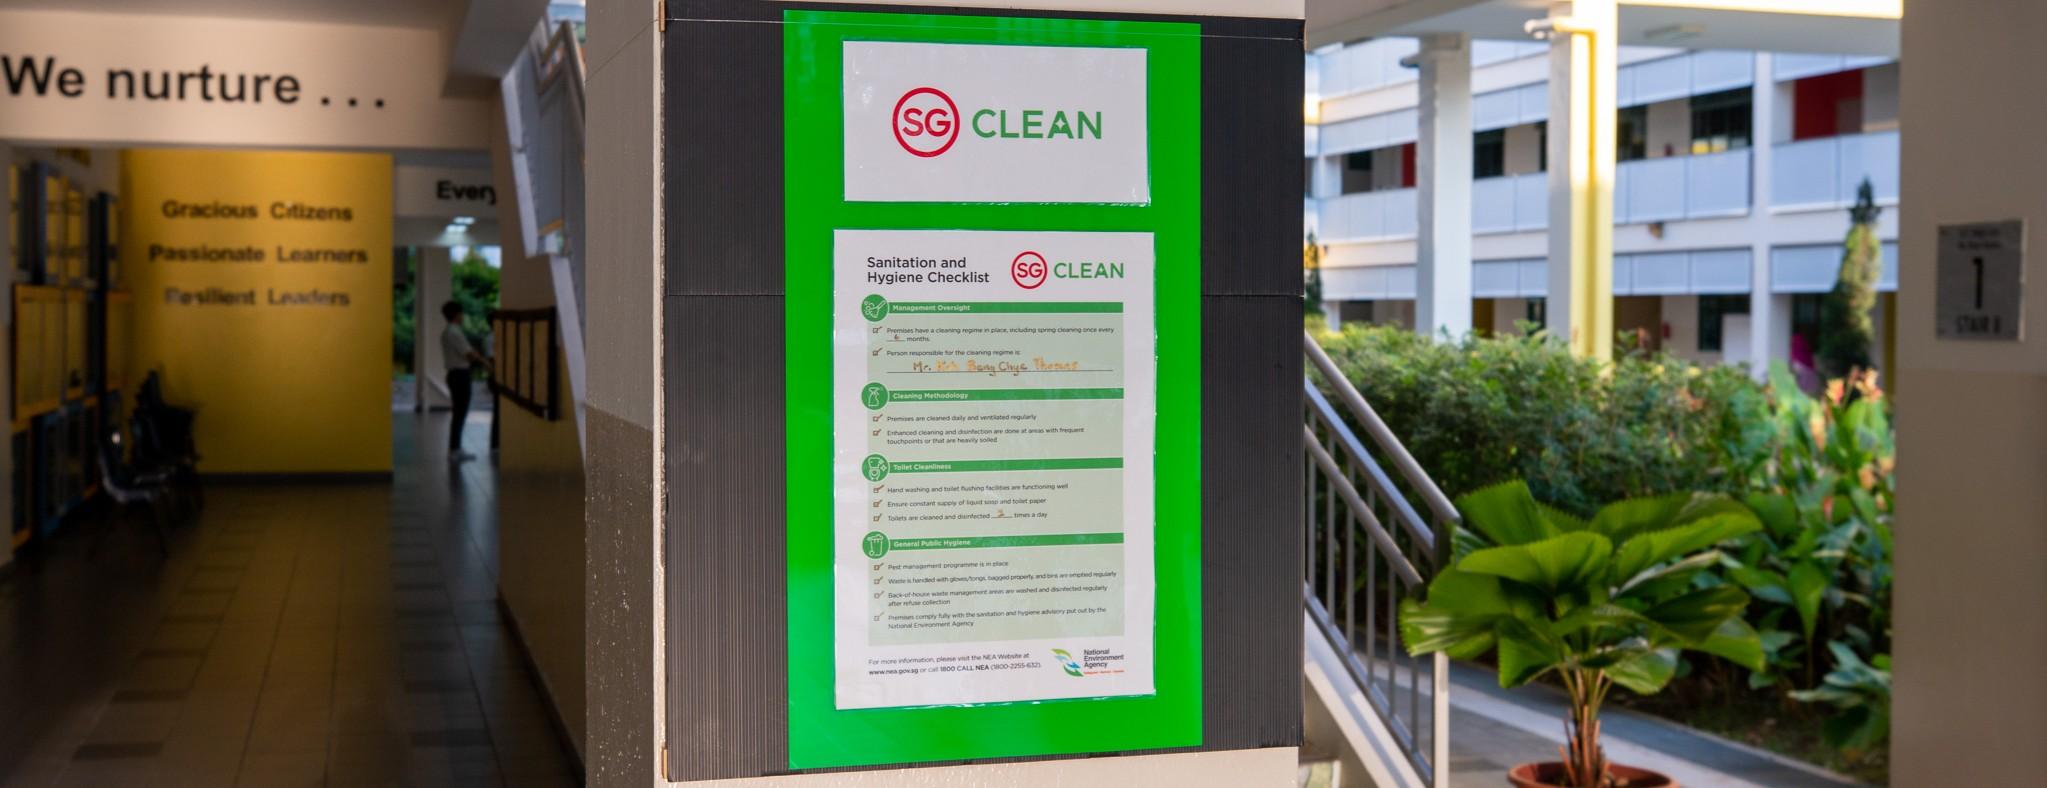 SG Clean certified school